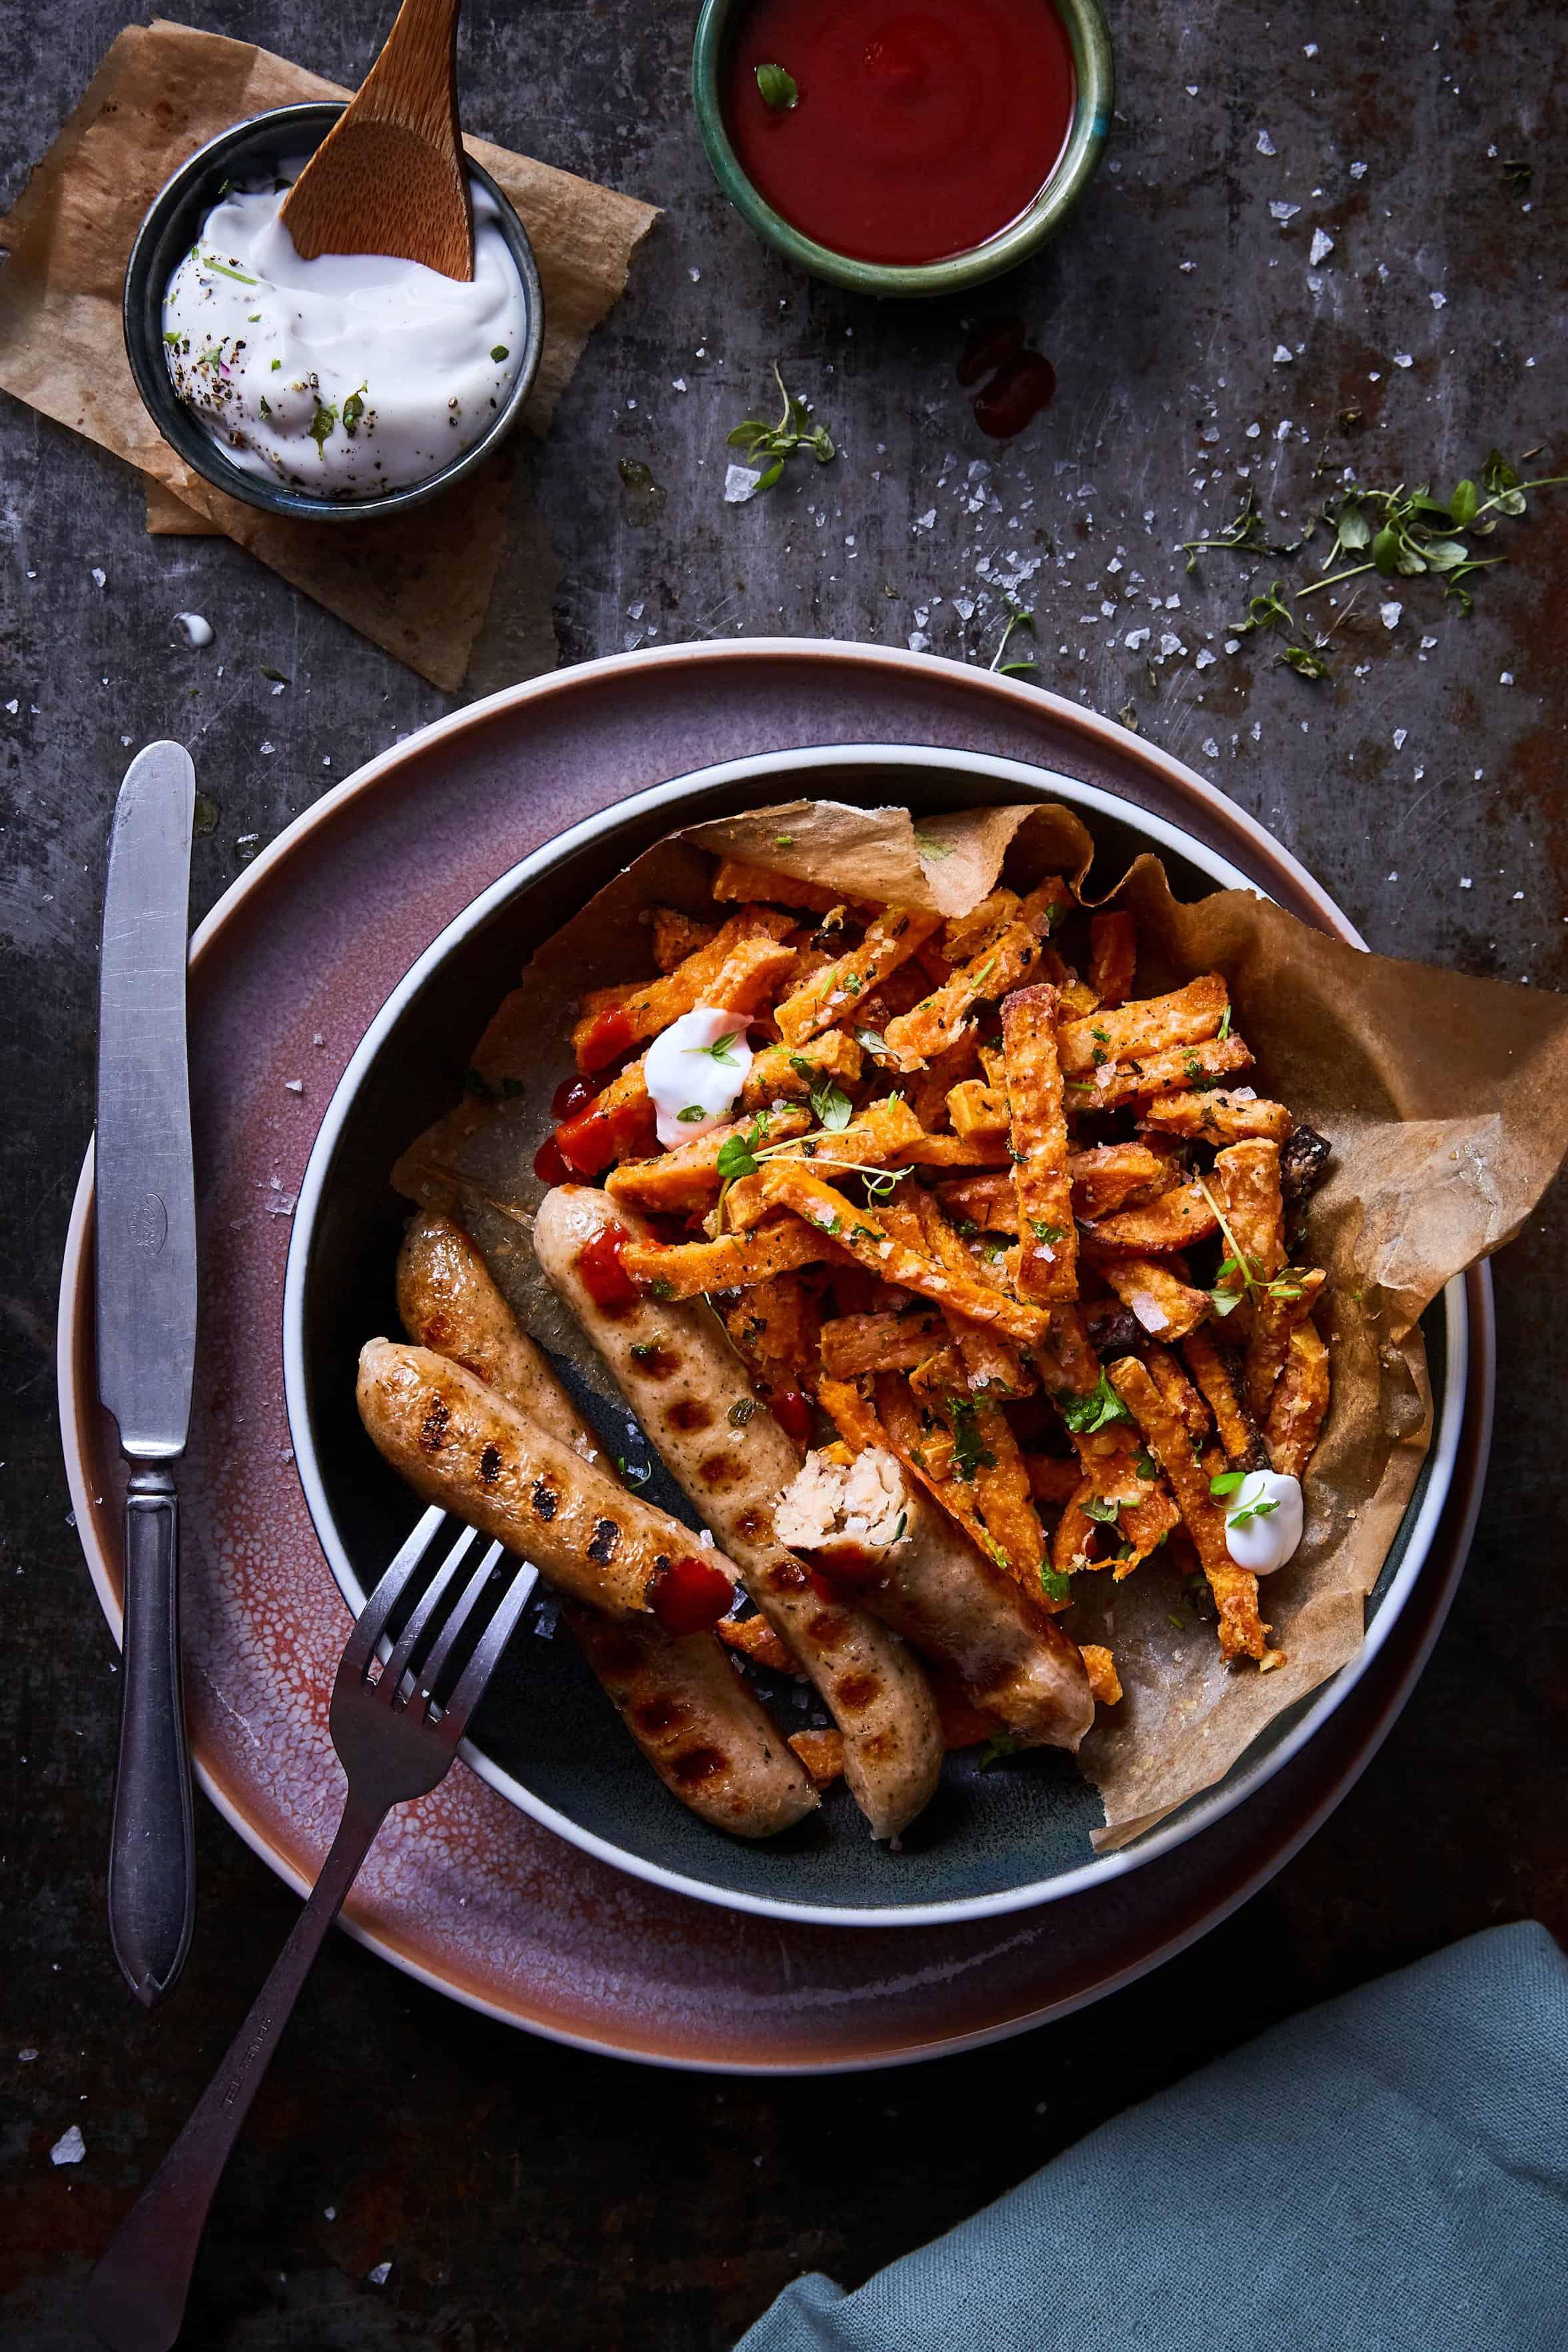 LikeMeat Rezept: Like-Bratwurst mit Süßkartoffelpommes